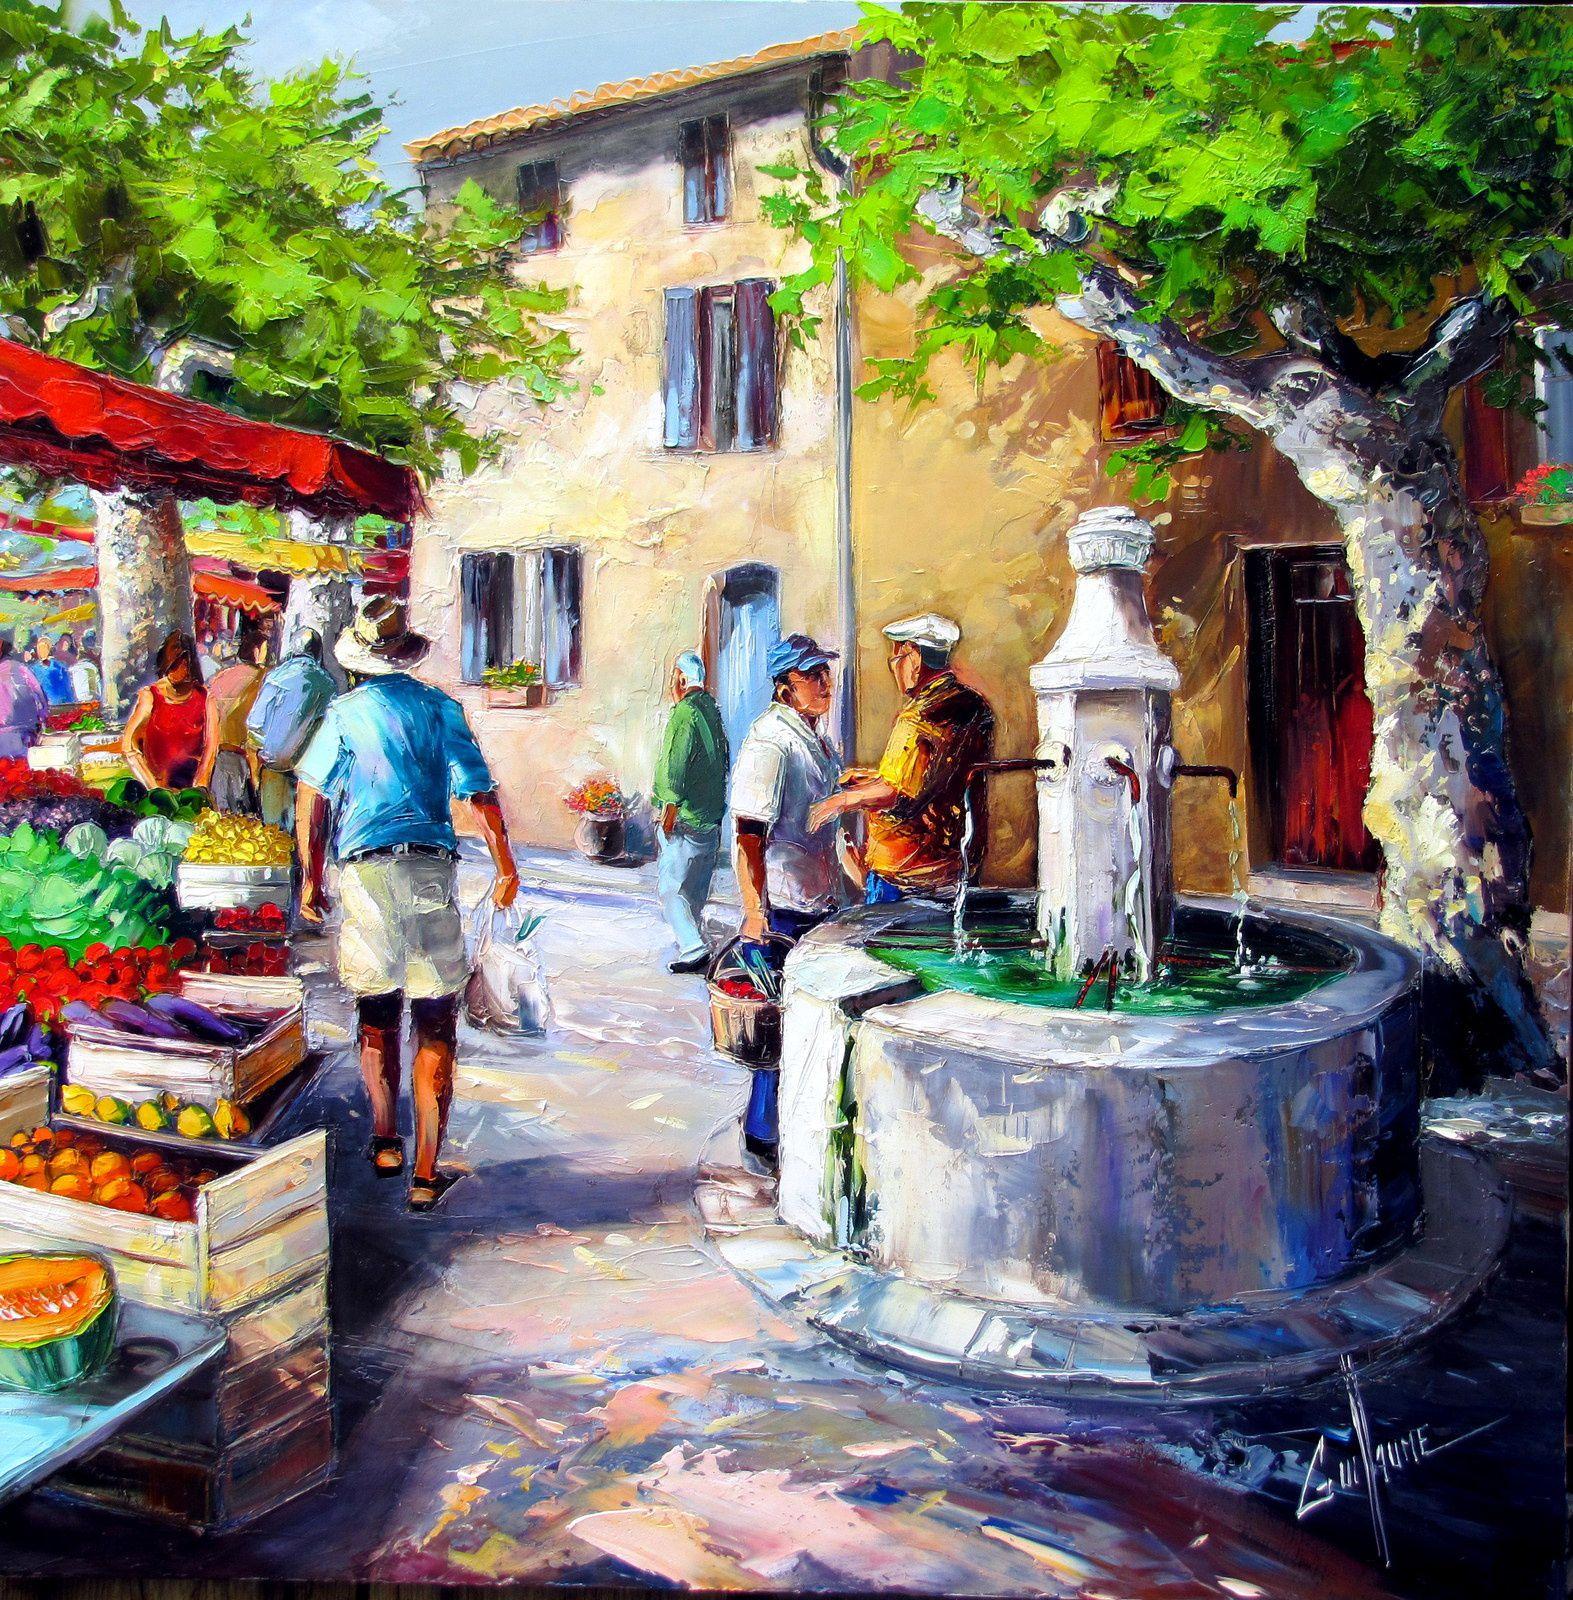 Tableaux de peintres Ob_af505c_img-0468